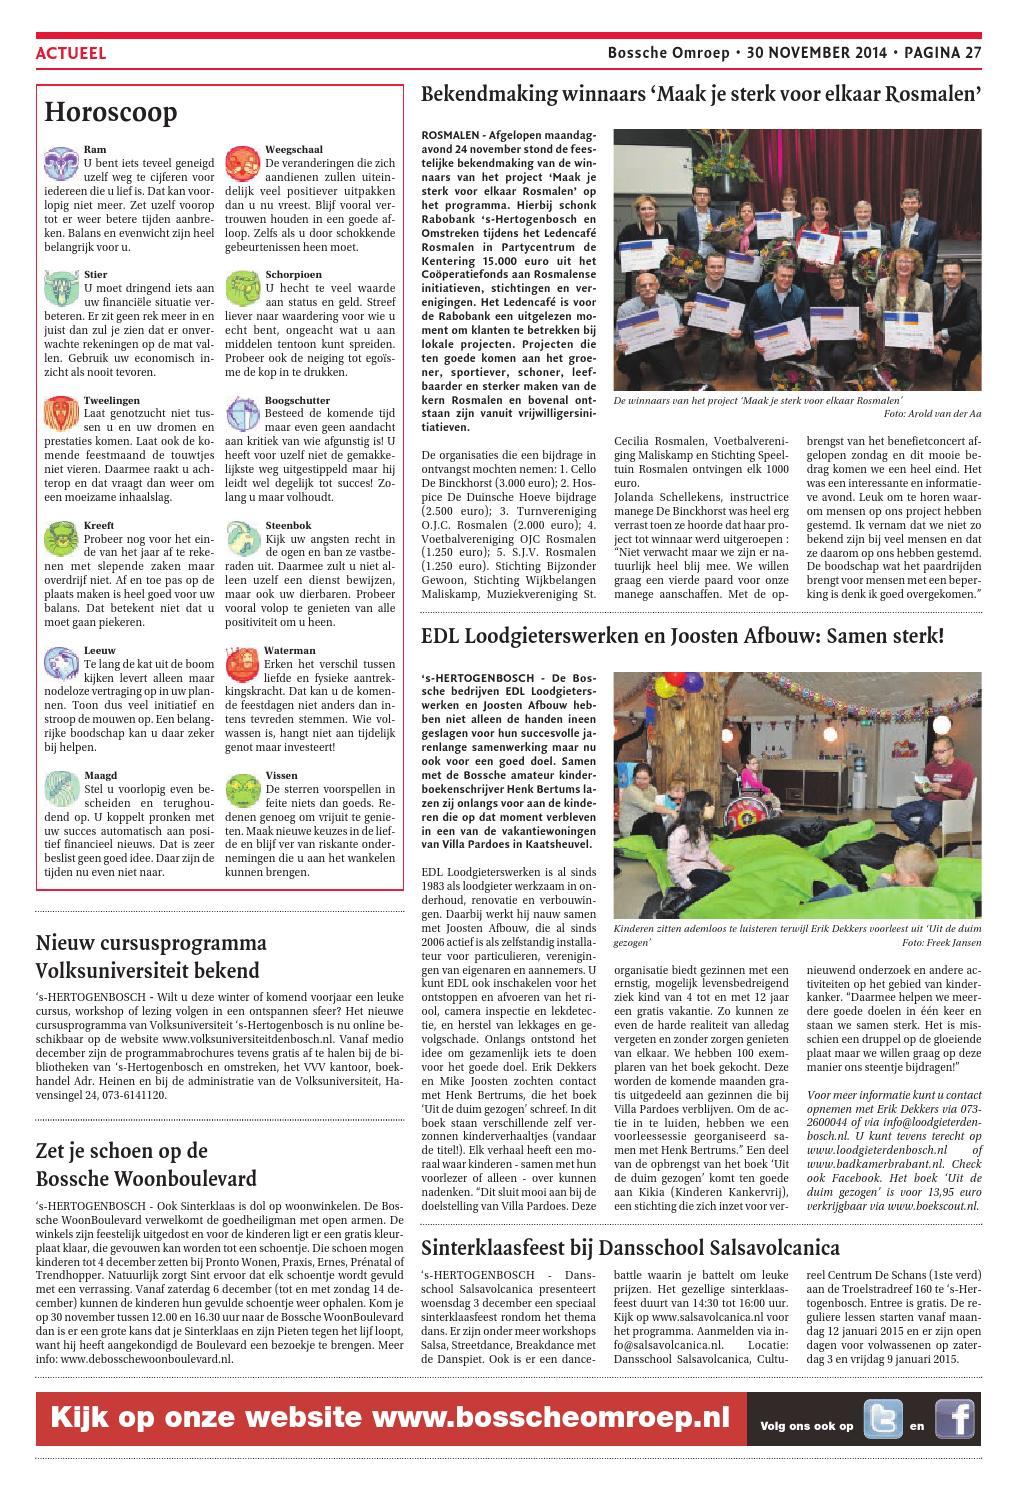 Kleurplaten En Zo Op De Manege.Bo Week48 2014 By De Persgroep Nederland Issuu